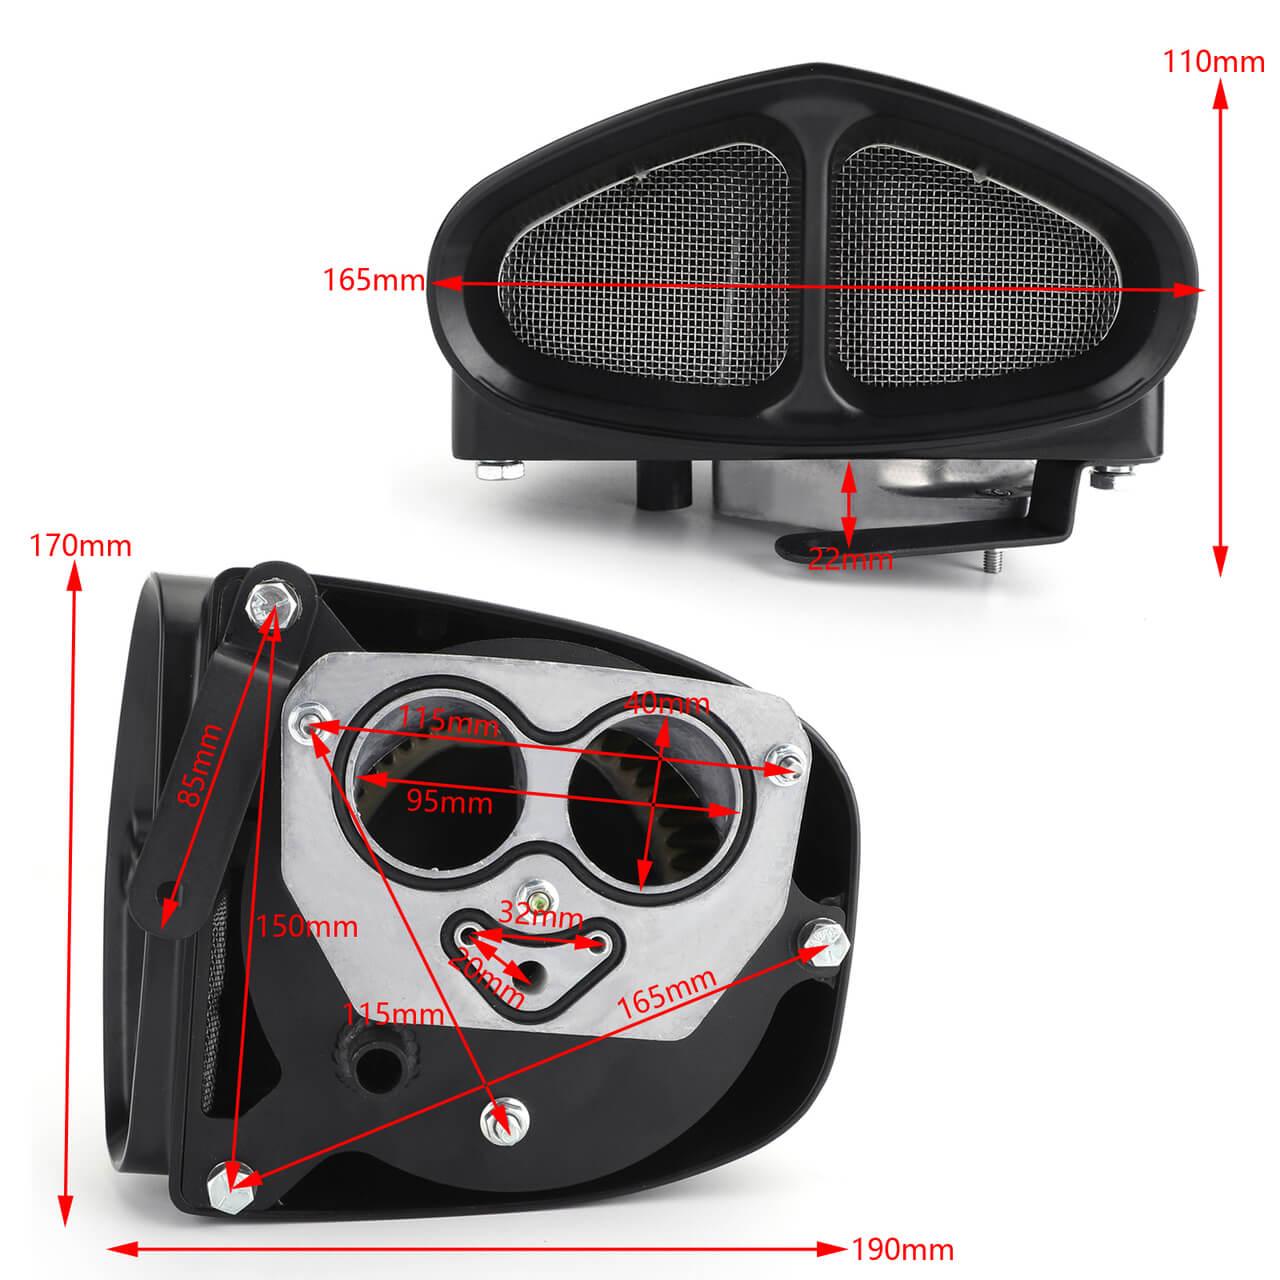 Air Intake Cleaner System for Yamaha XVS950C Bolt / R-Spec 14-19 06-0267 XVS950CR 15-16 Black